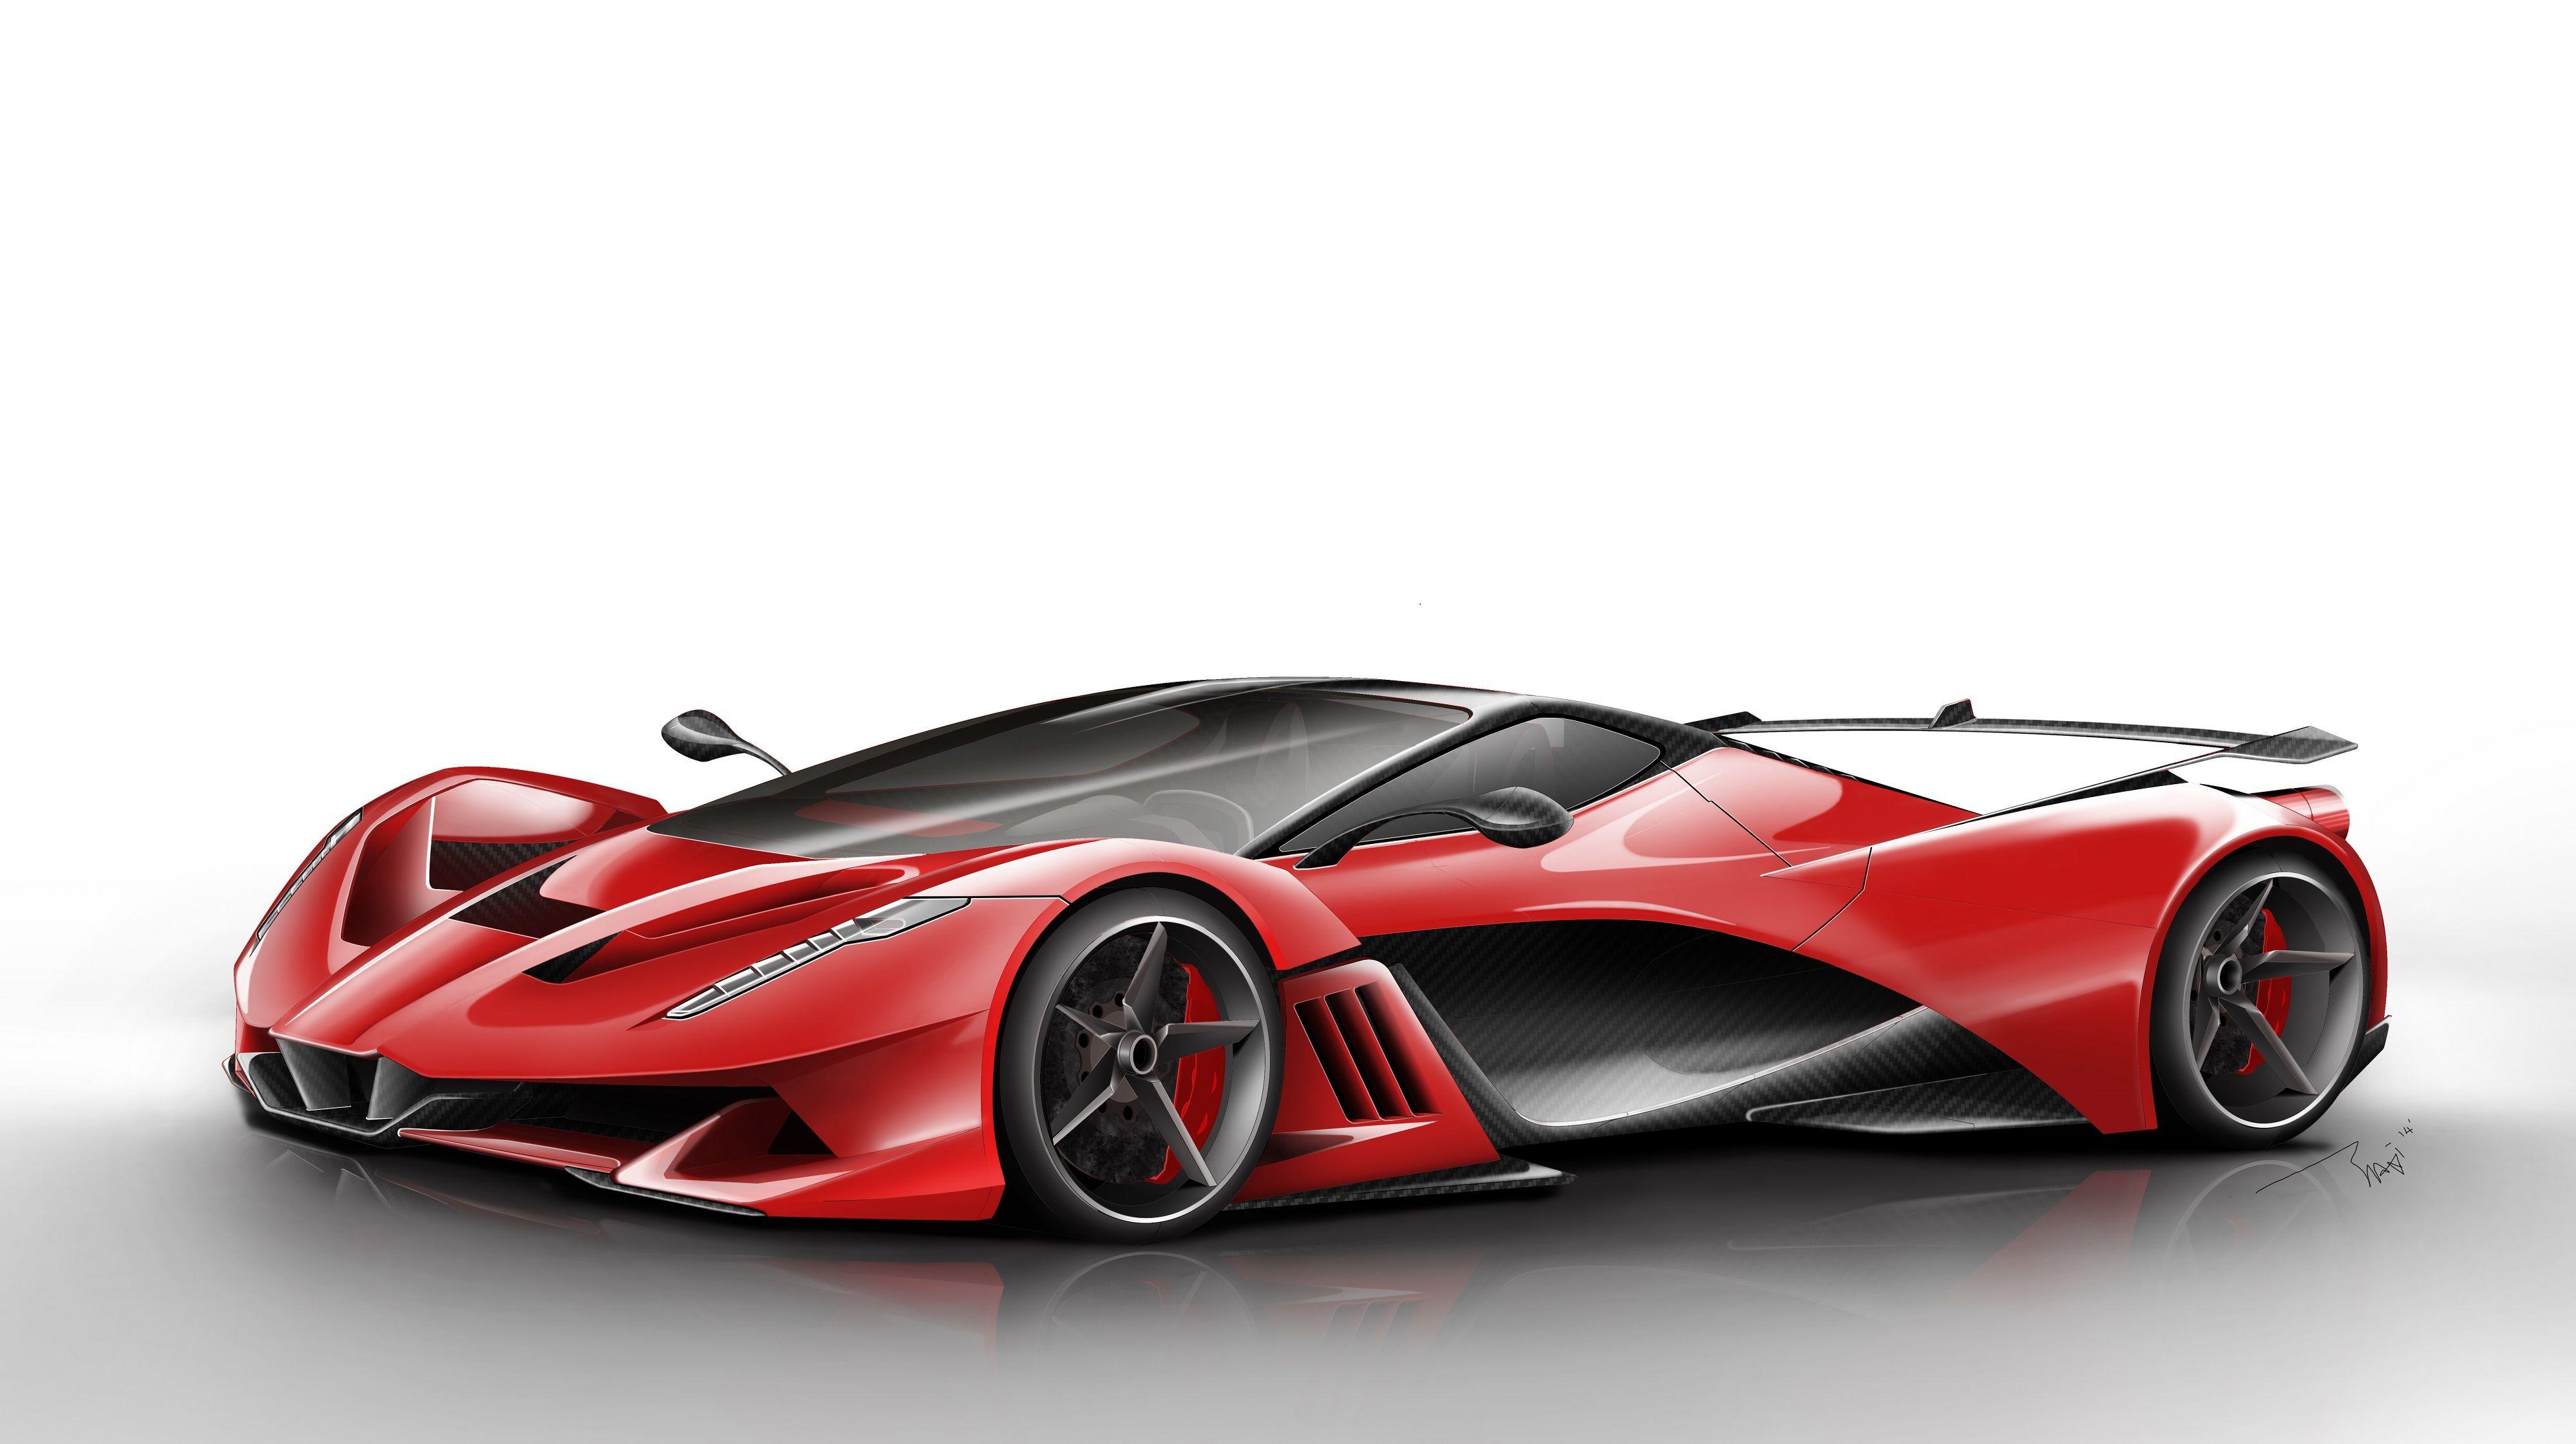 Ferrari laferrari vision by chong jia yi hypercars cars ferrari laferrari vision by chong jia yi hypercars vanachro Gallery